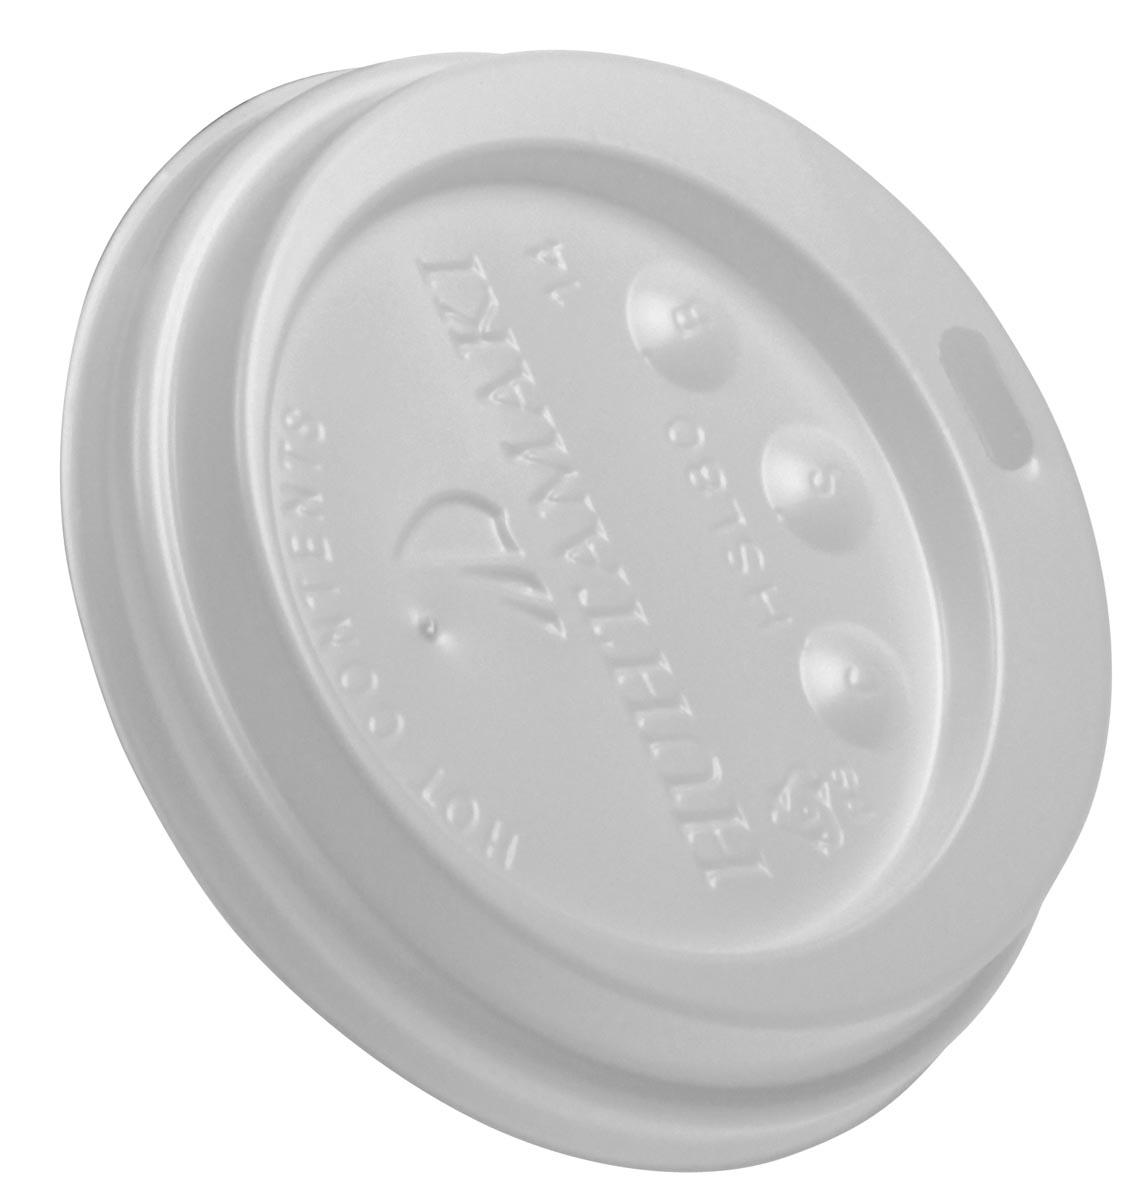 Deksel Coffee To Go, wit, diameter 80 mm, pak van 100 stuks